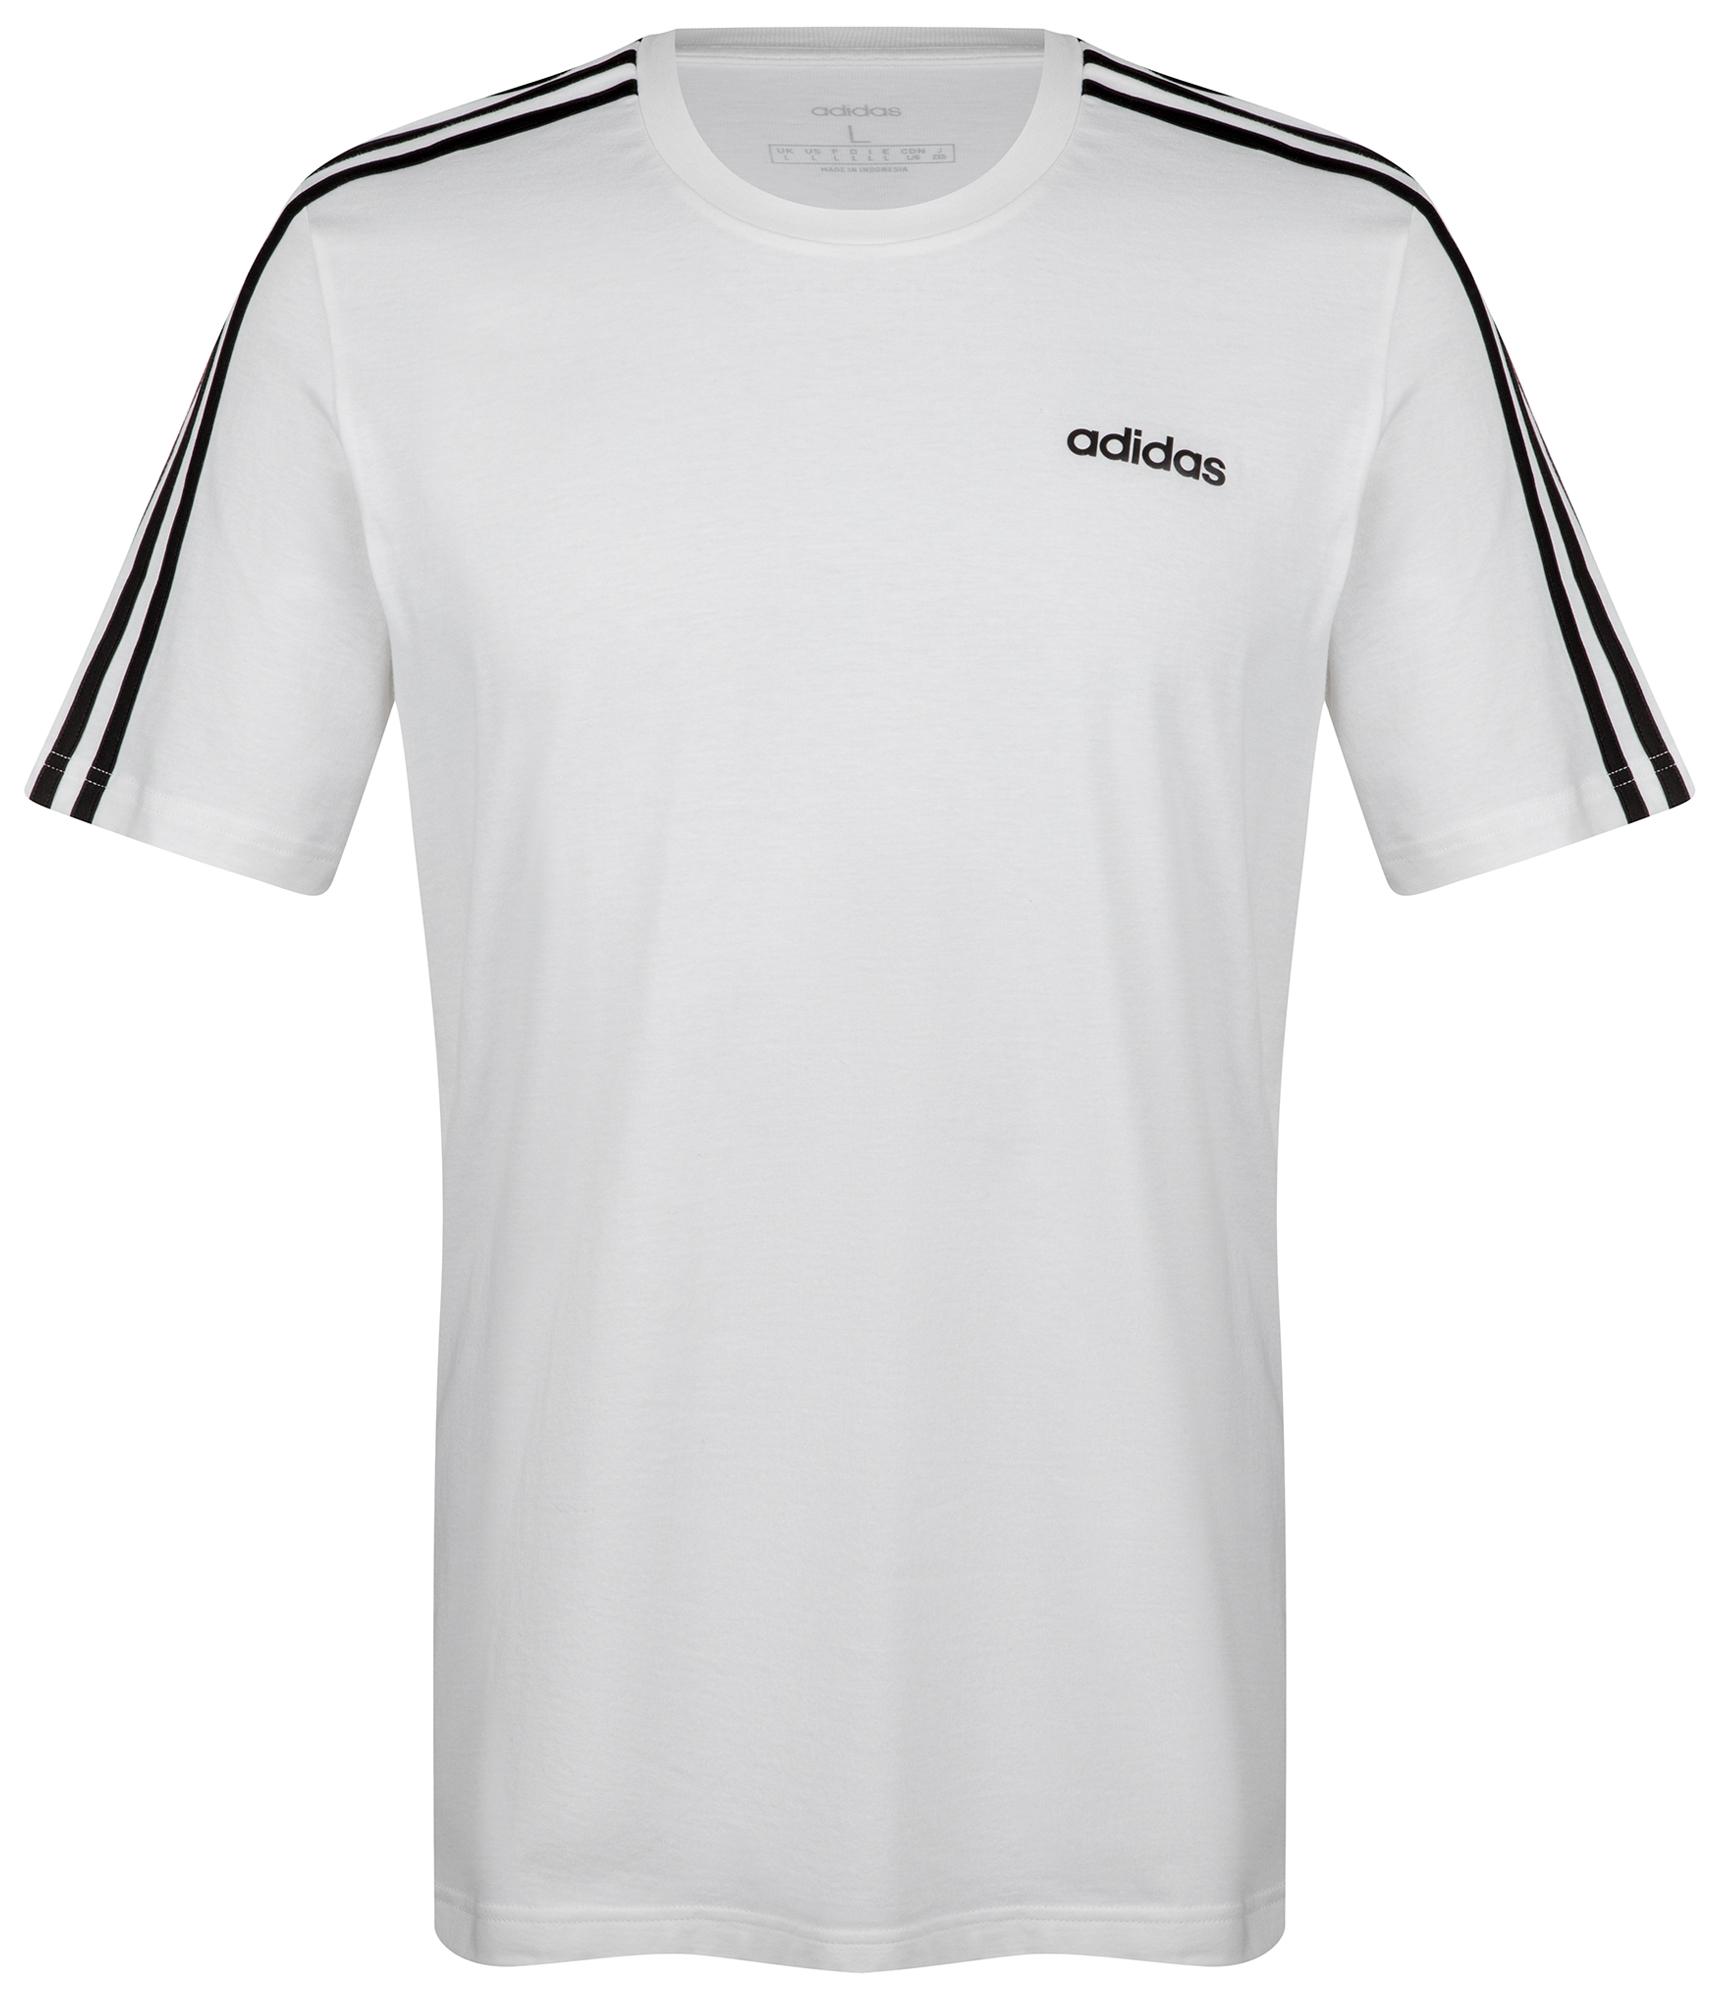 Adidas Футболка мужская Adidas, размер 48-50 adidas футболка freelift grad linkha